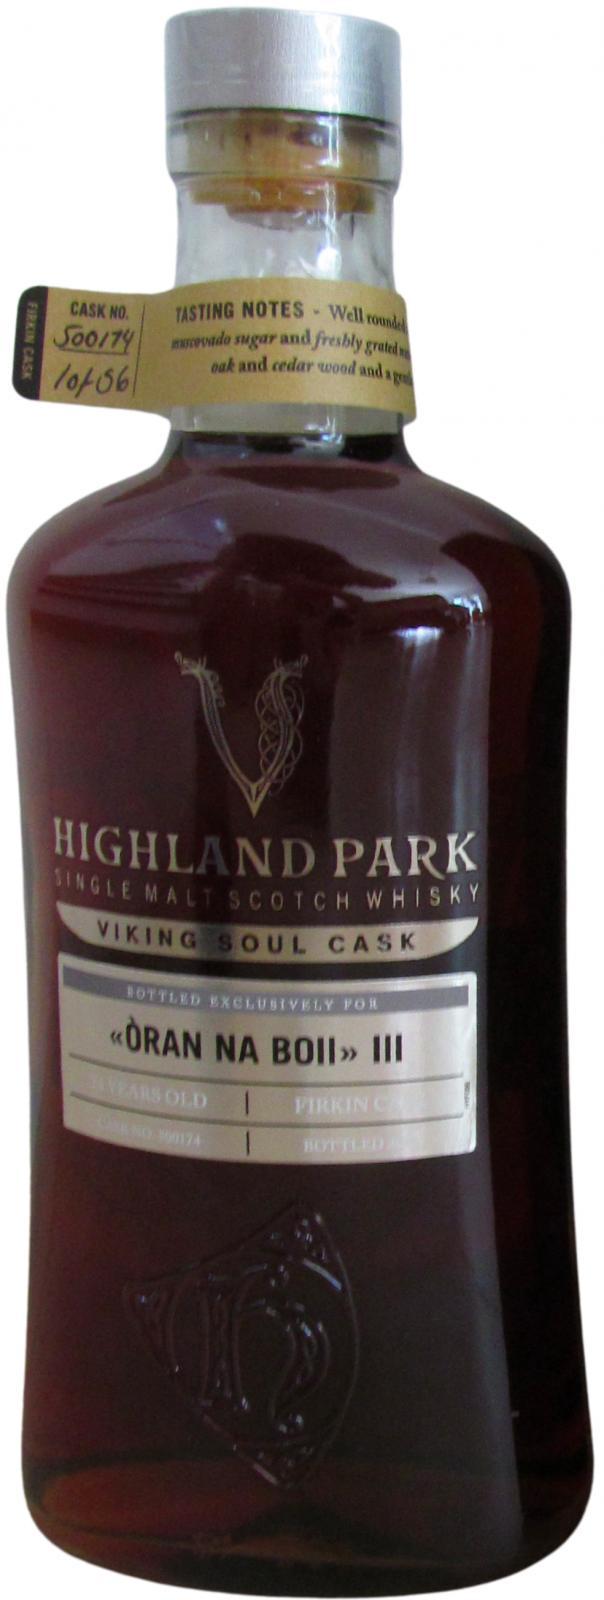 Highland Park 14-year-old